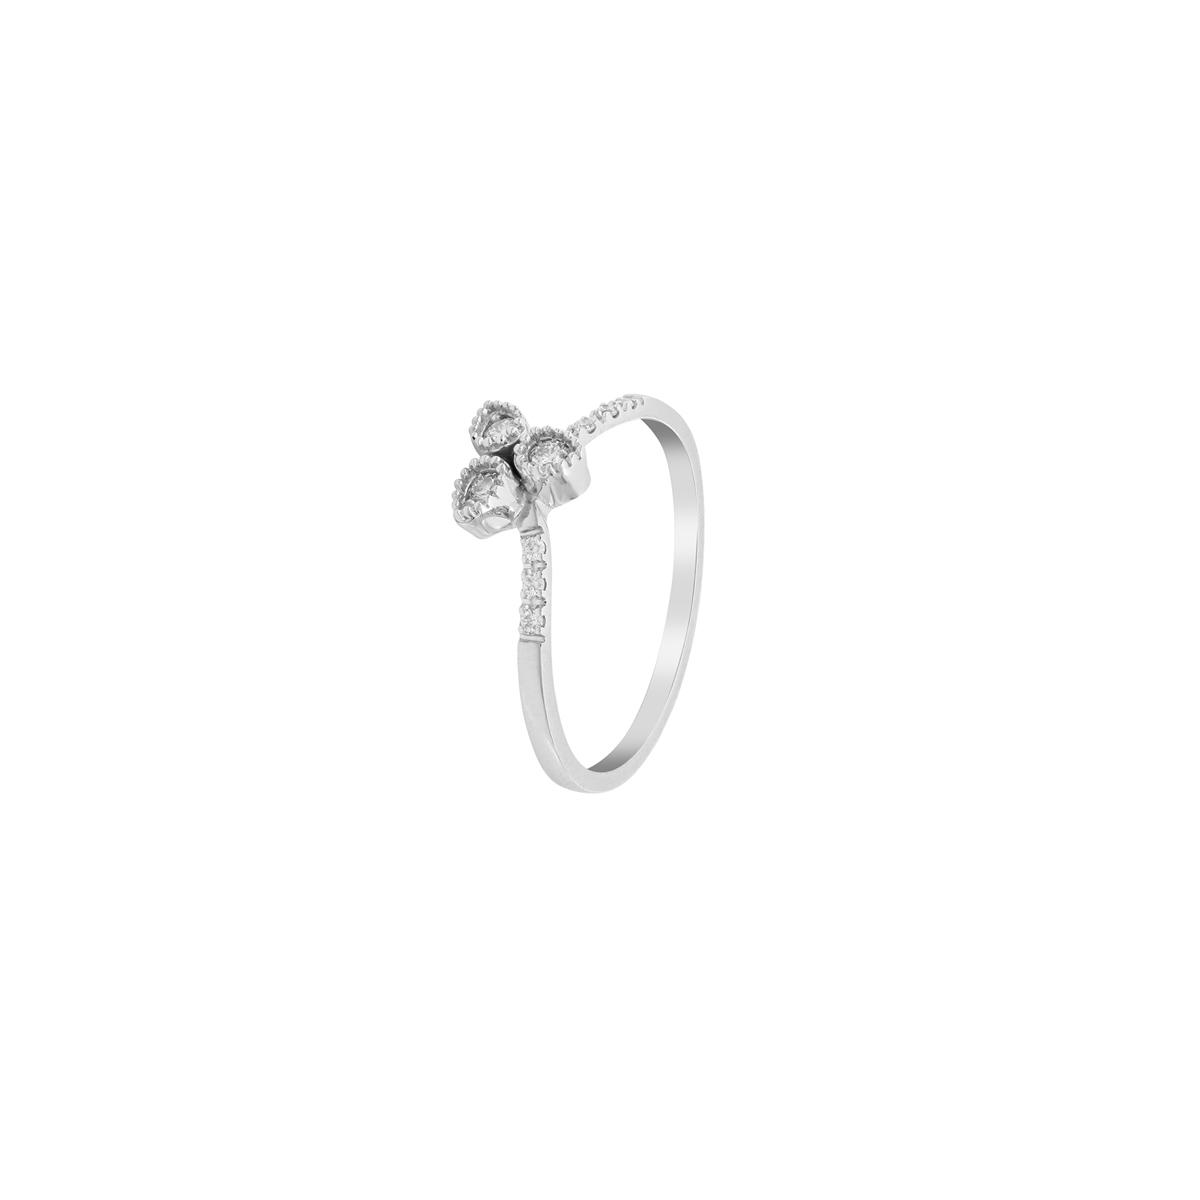 White Gold Trinity Ring